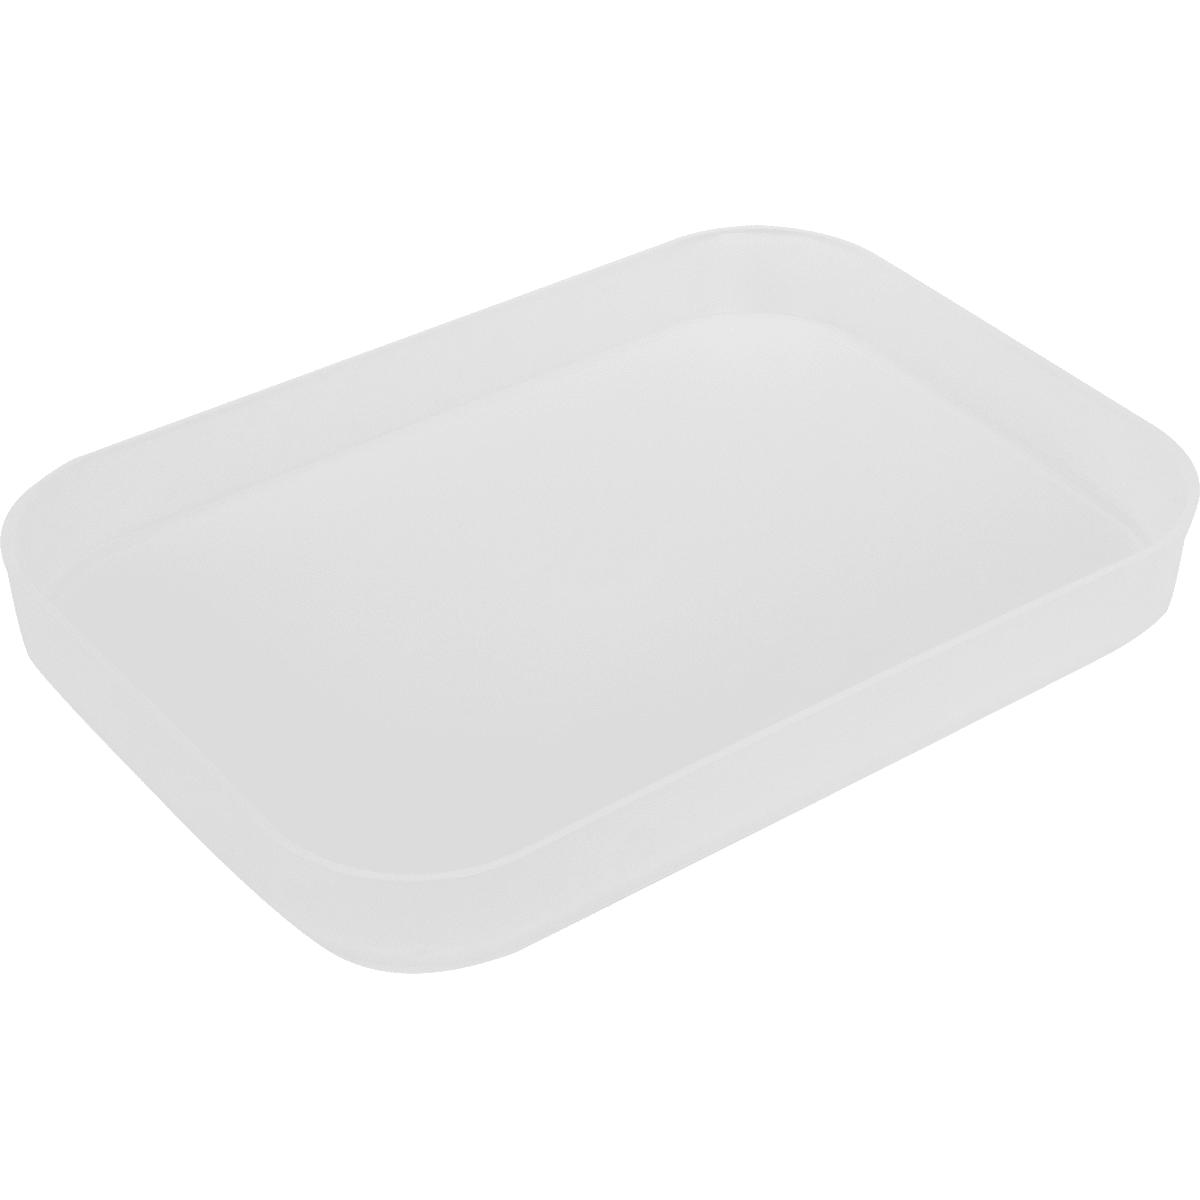 Крышка малая, 113x21x159 мм, пластик, цвет прозрачный